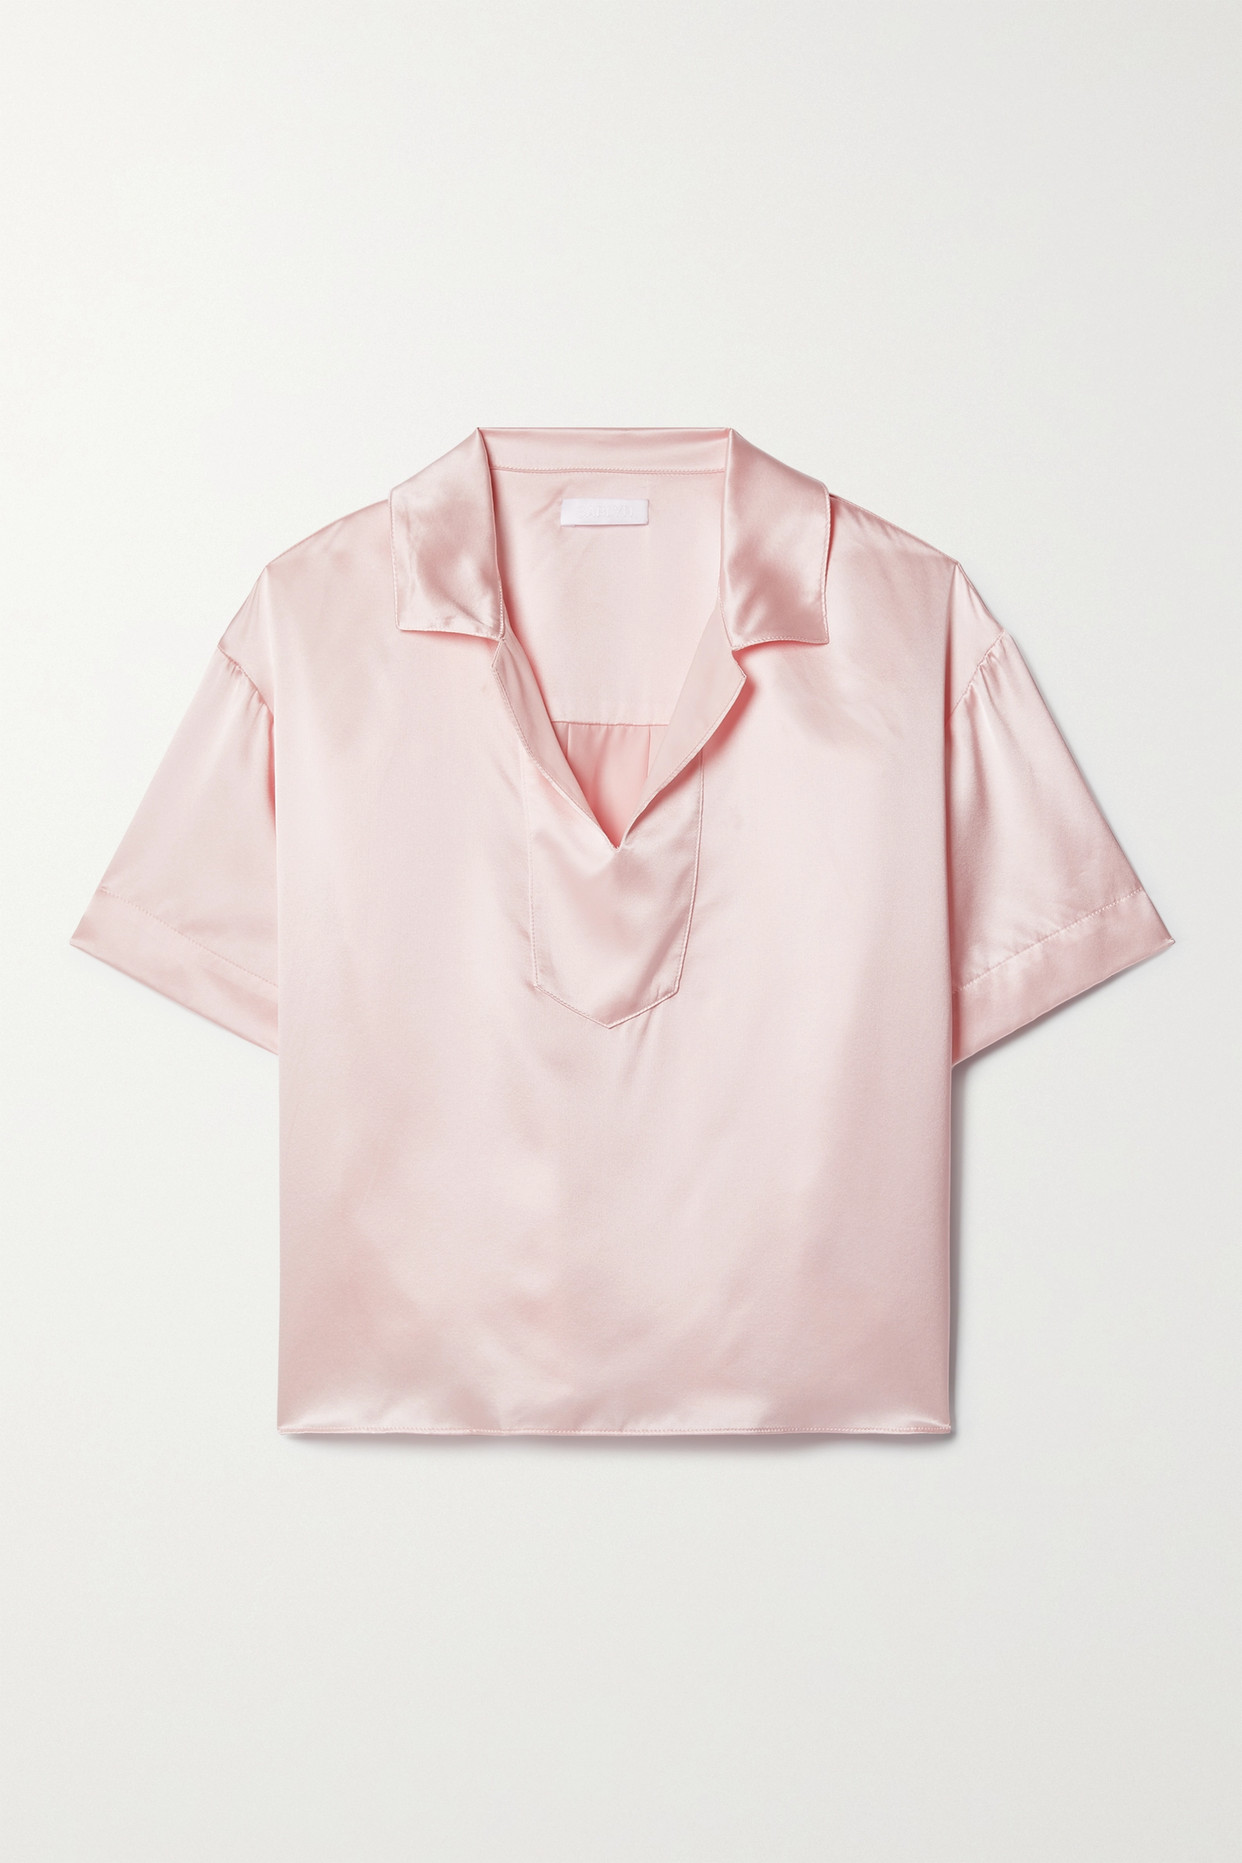 Sablyn Valeria Silk-satin Blouse In Pink